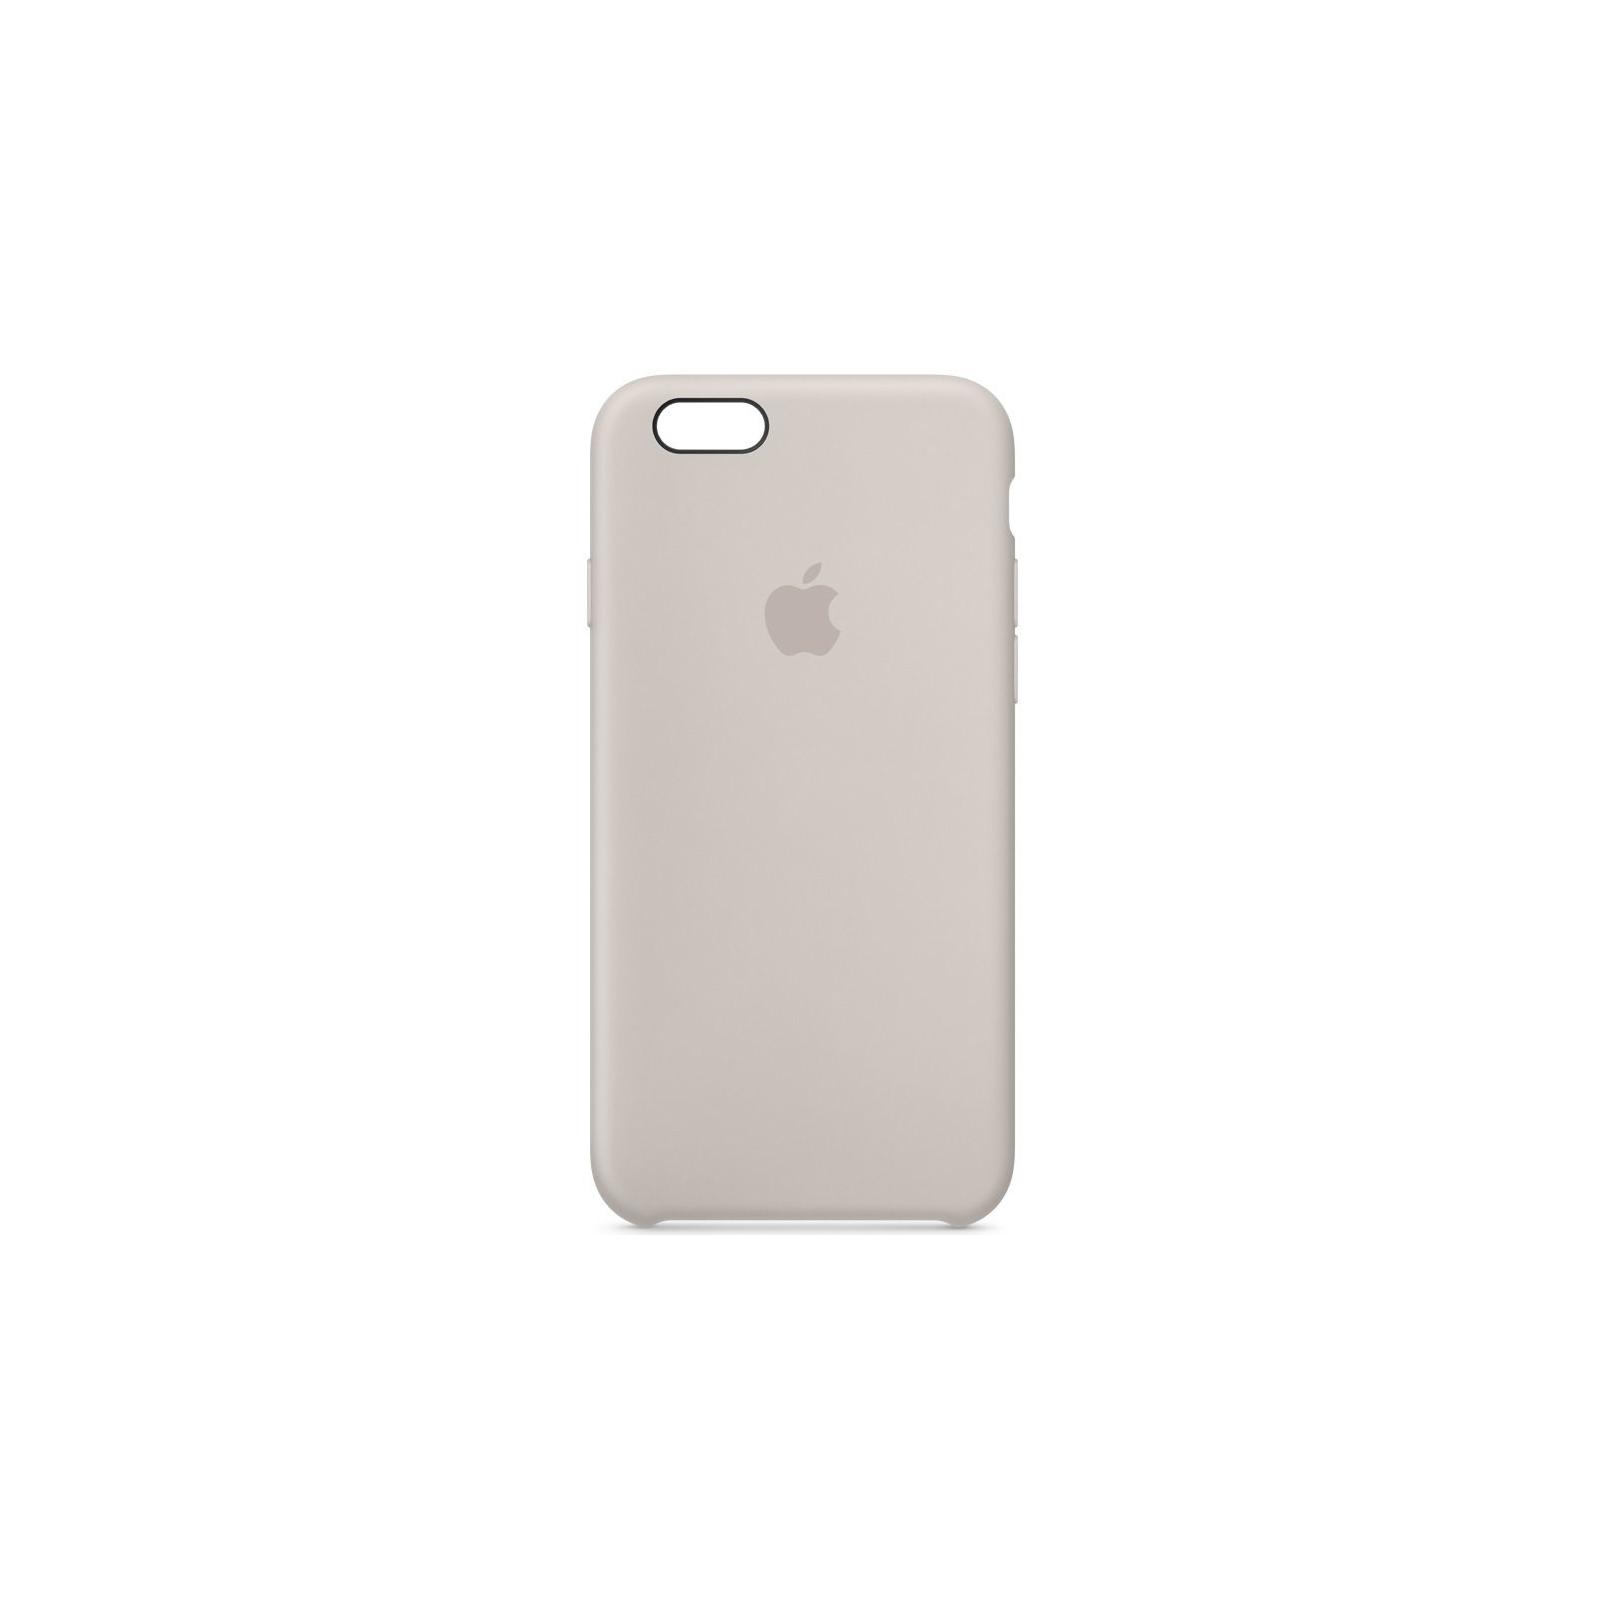 Чехол для моб. телефона Apple для iPhone 6/6s Stone (MKY42ZM/A)